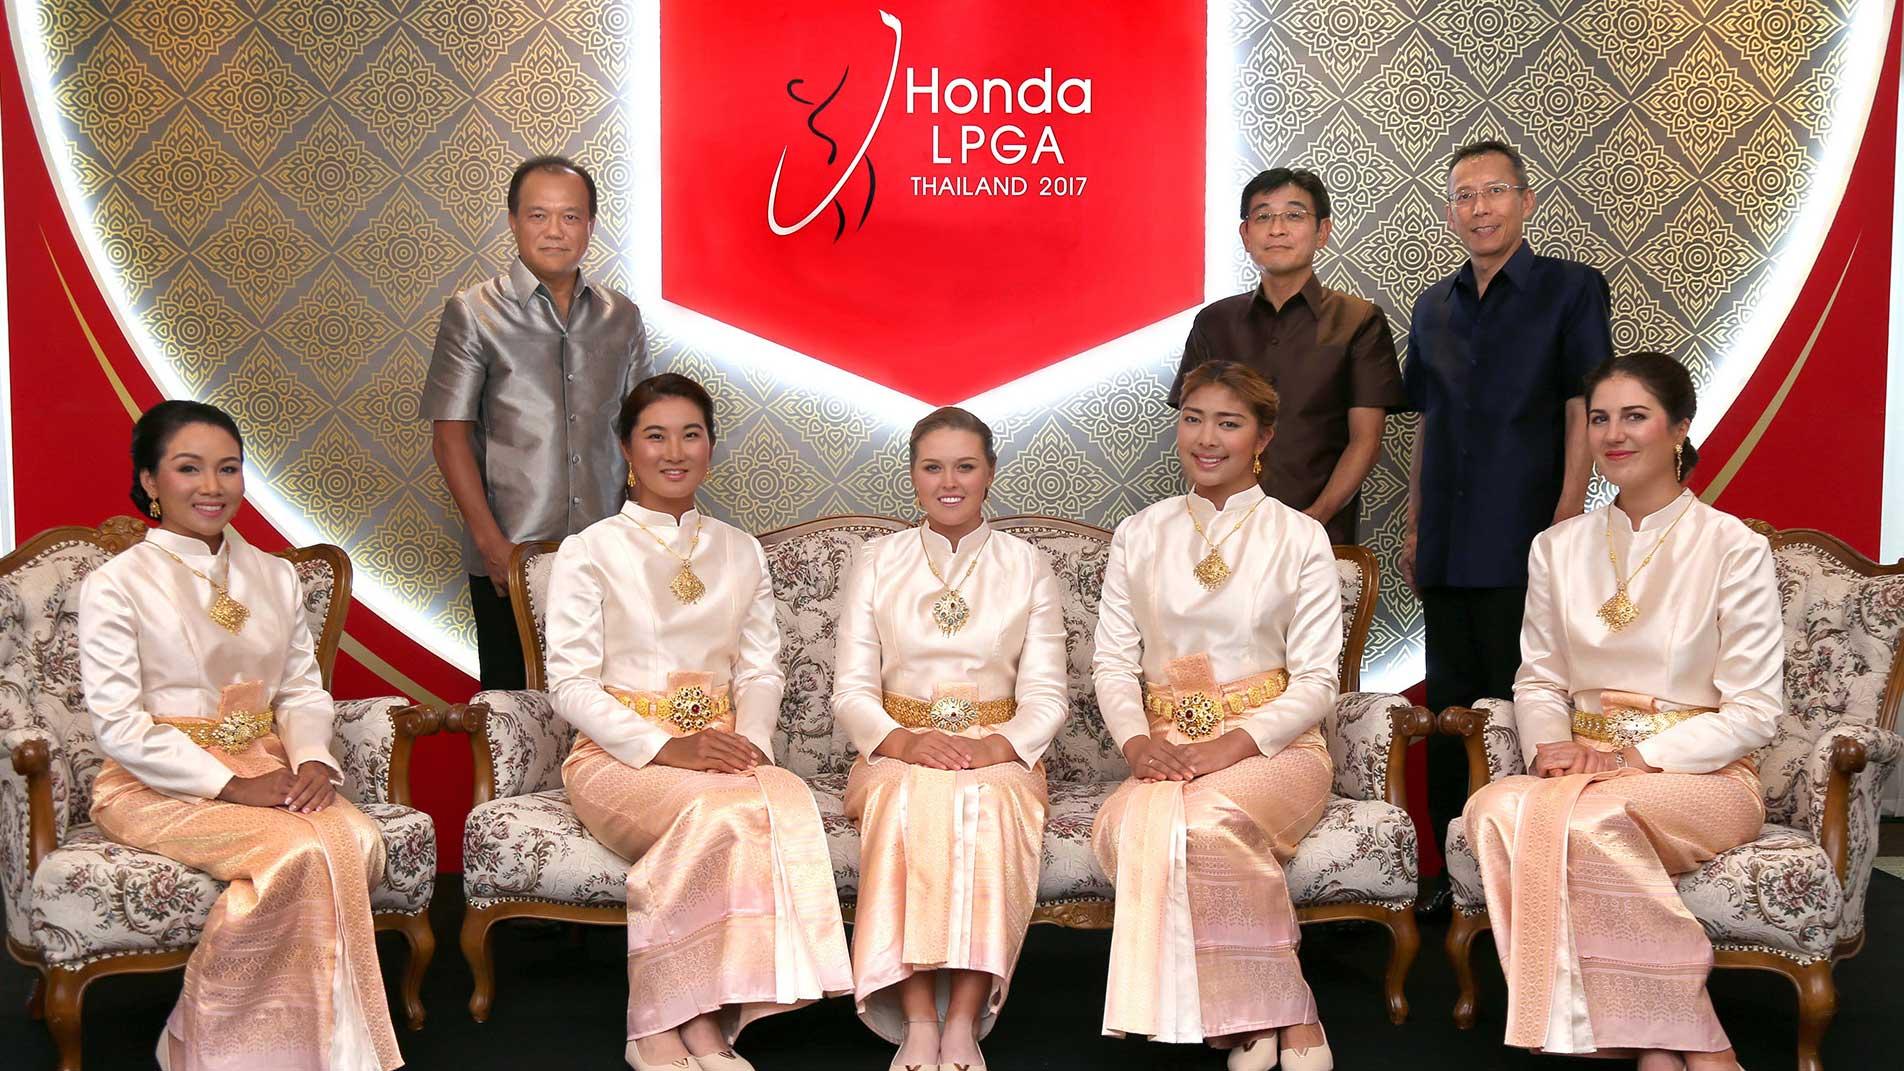 Honda LPGA Thailand Social Media Recap